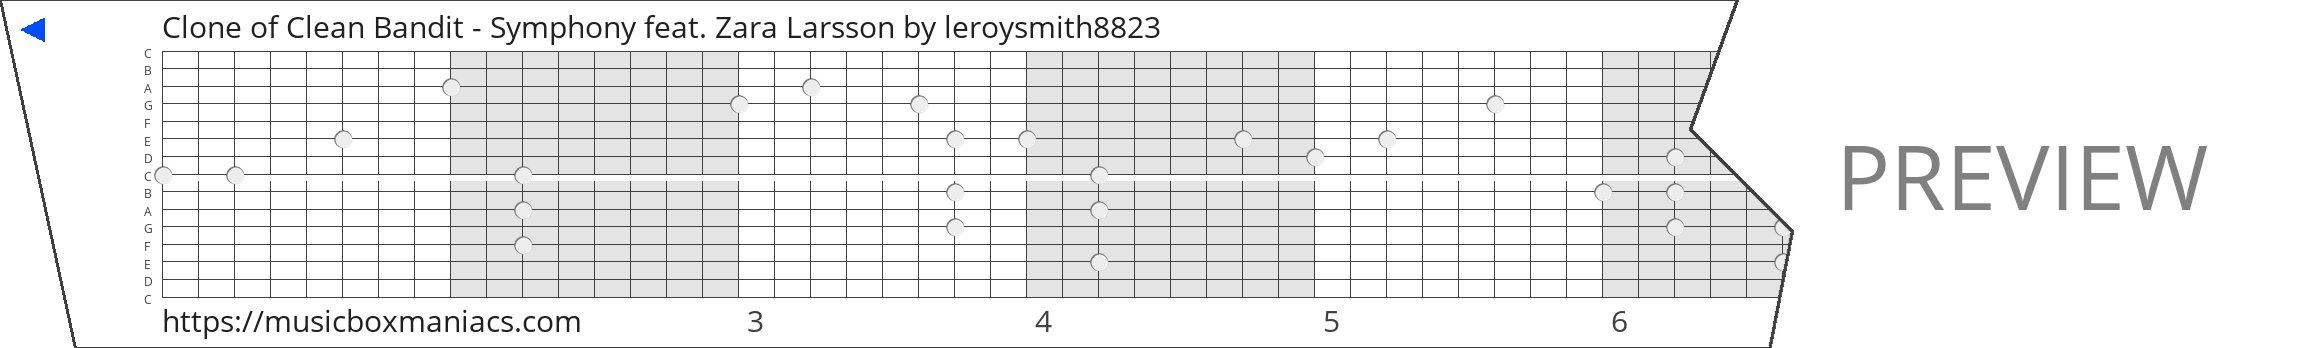 Clone of Clean Bandit - Symphony feat. Zara Larsson 15 note music box paper strip